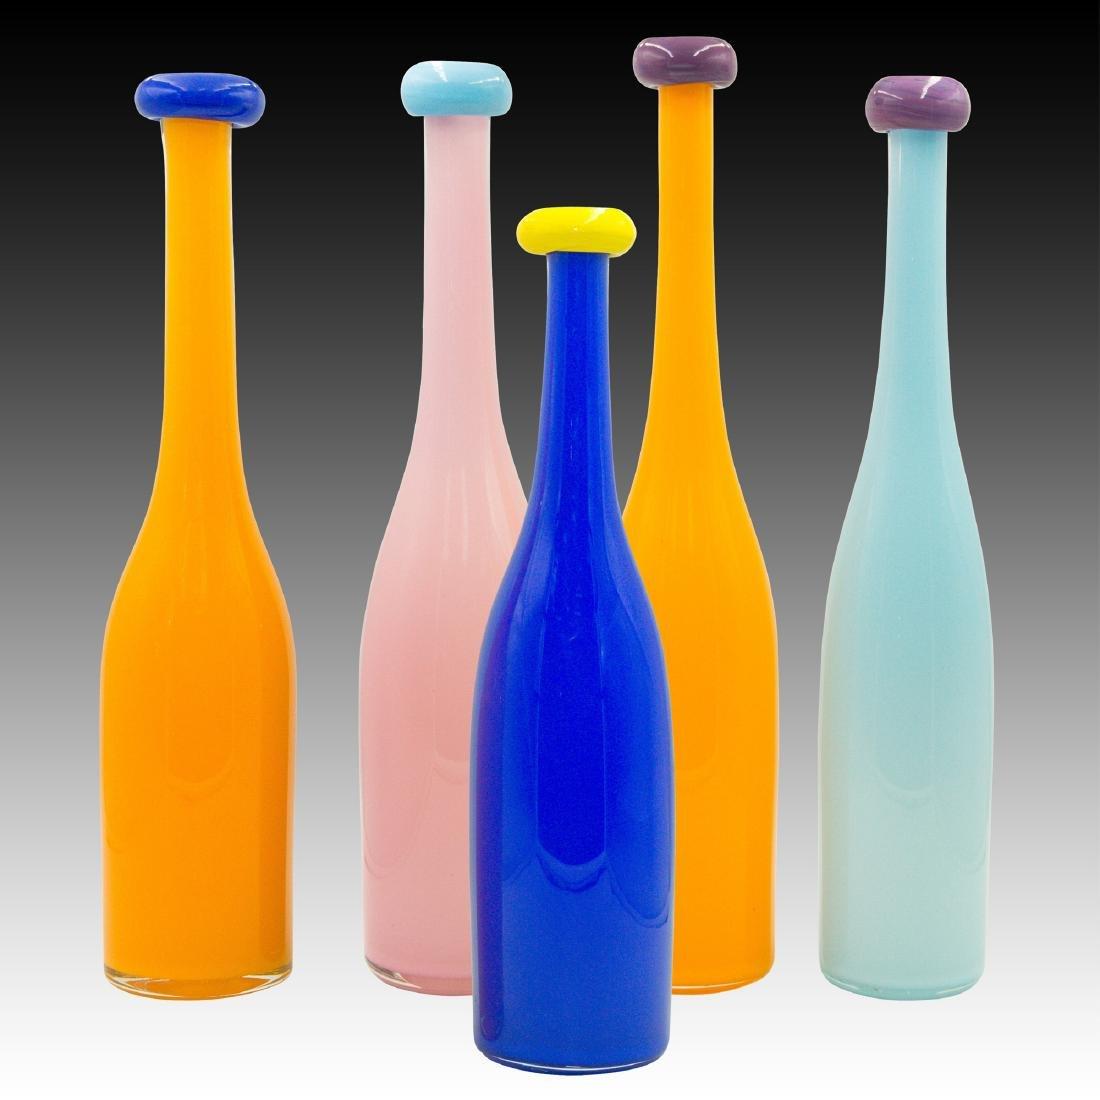 Set of 5 Chuck Vannatta Modern Art Glass Vases